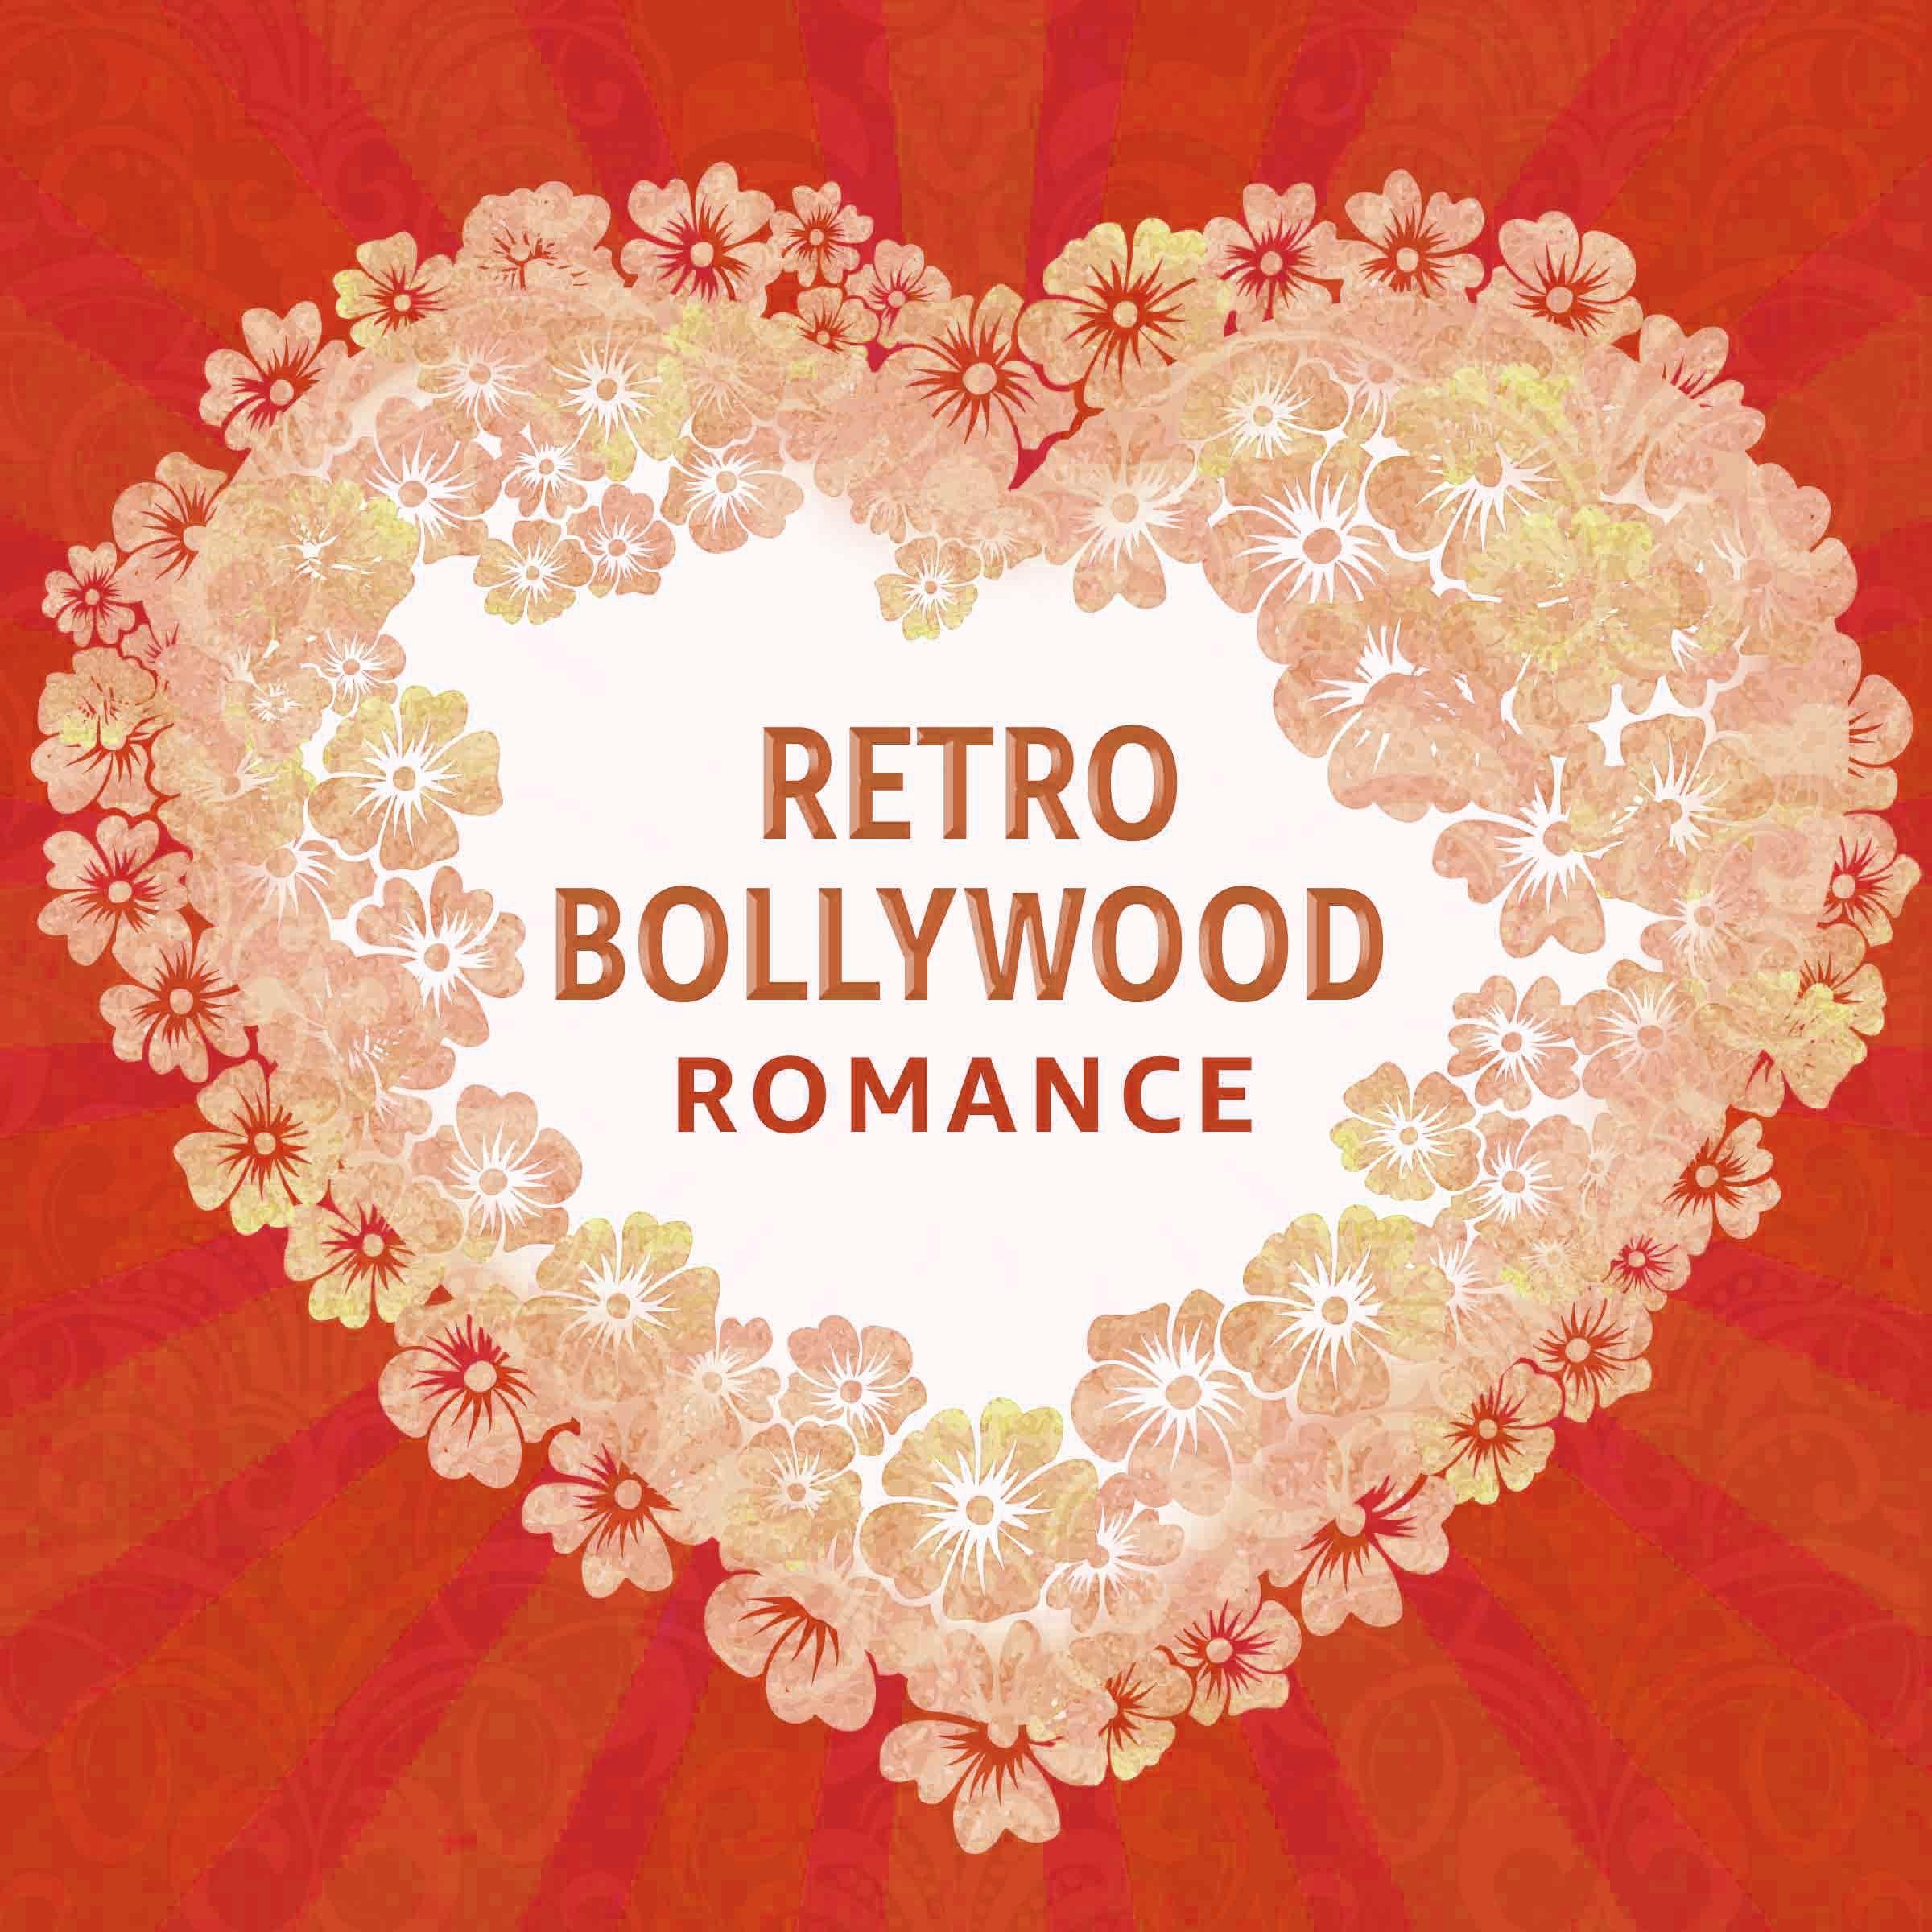 Bollywood Retro Romance